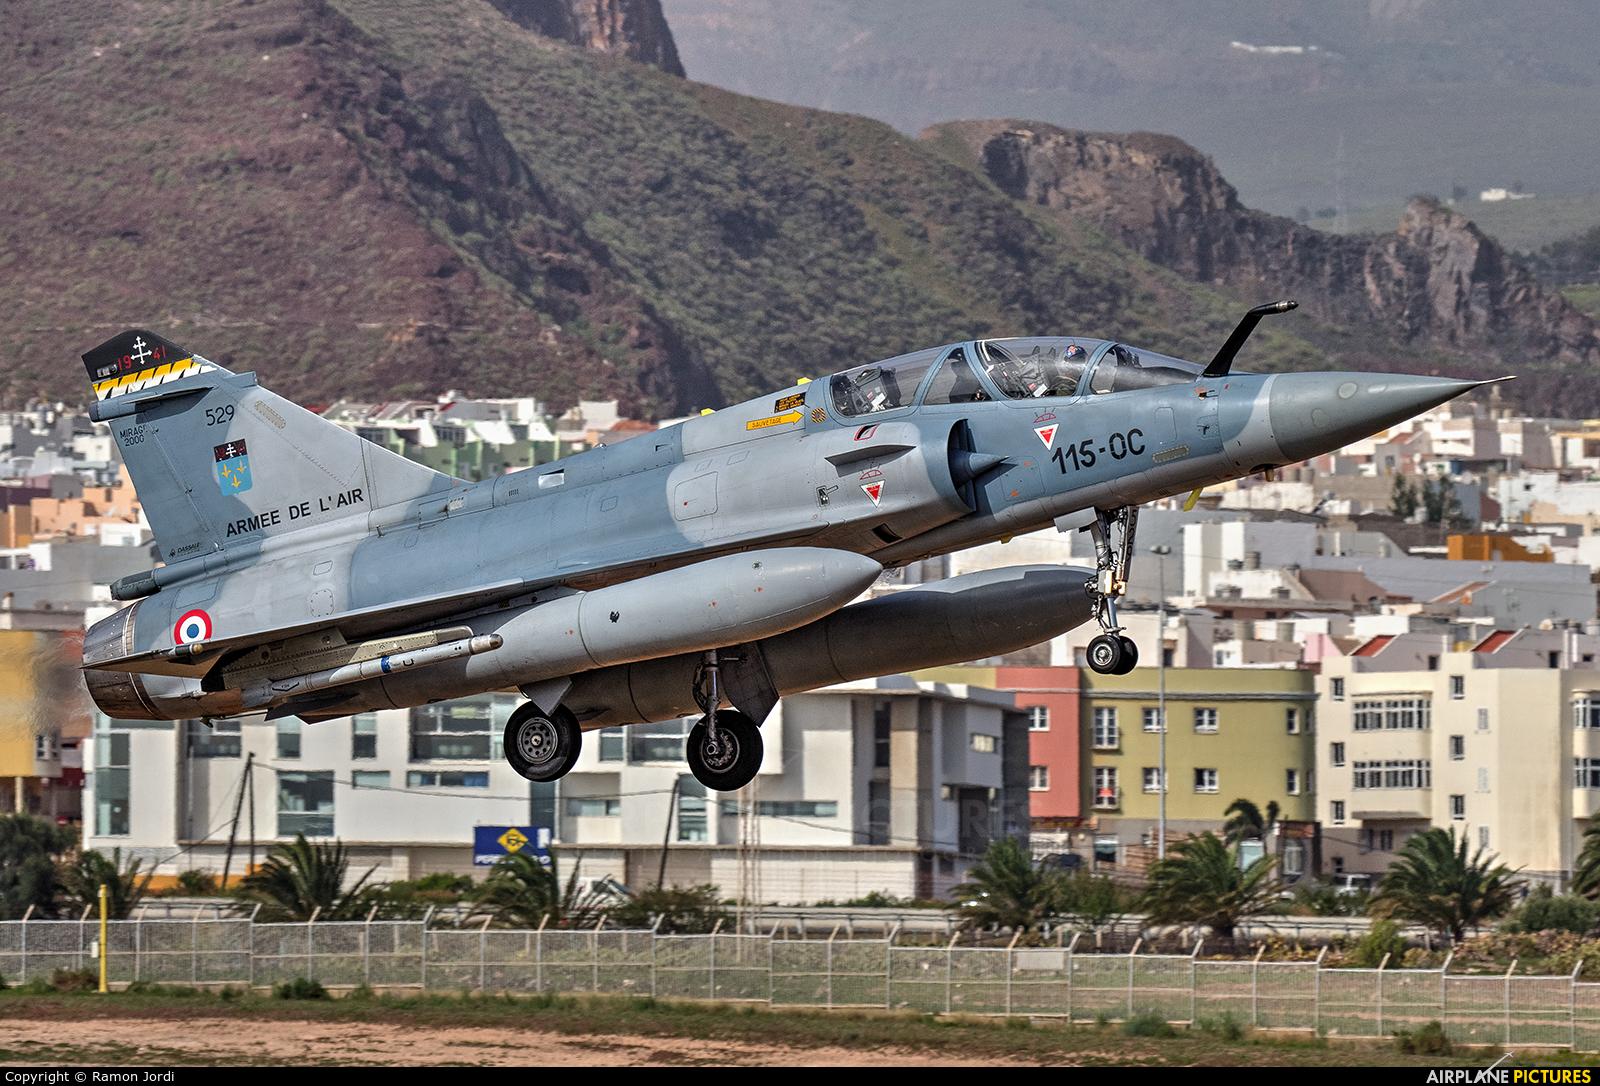 France - Air Force 529 aircraft at Las Palmas de Gran Canaria